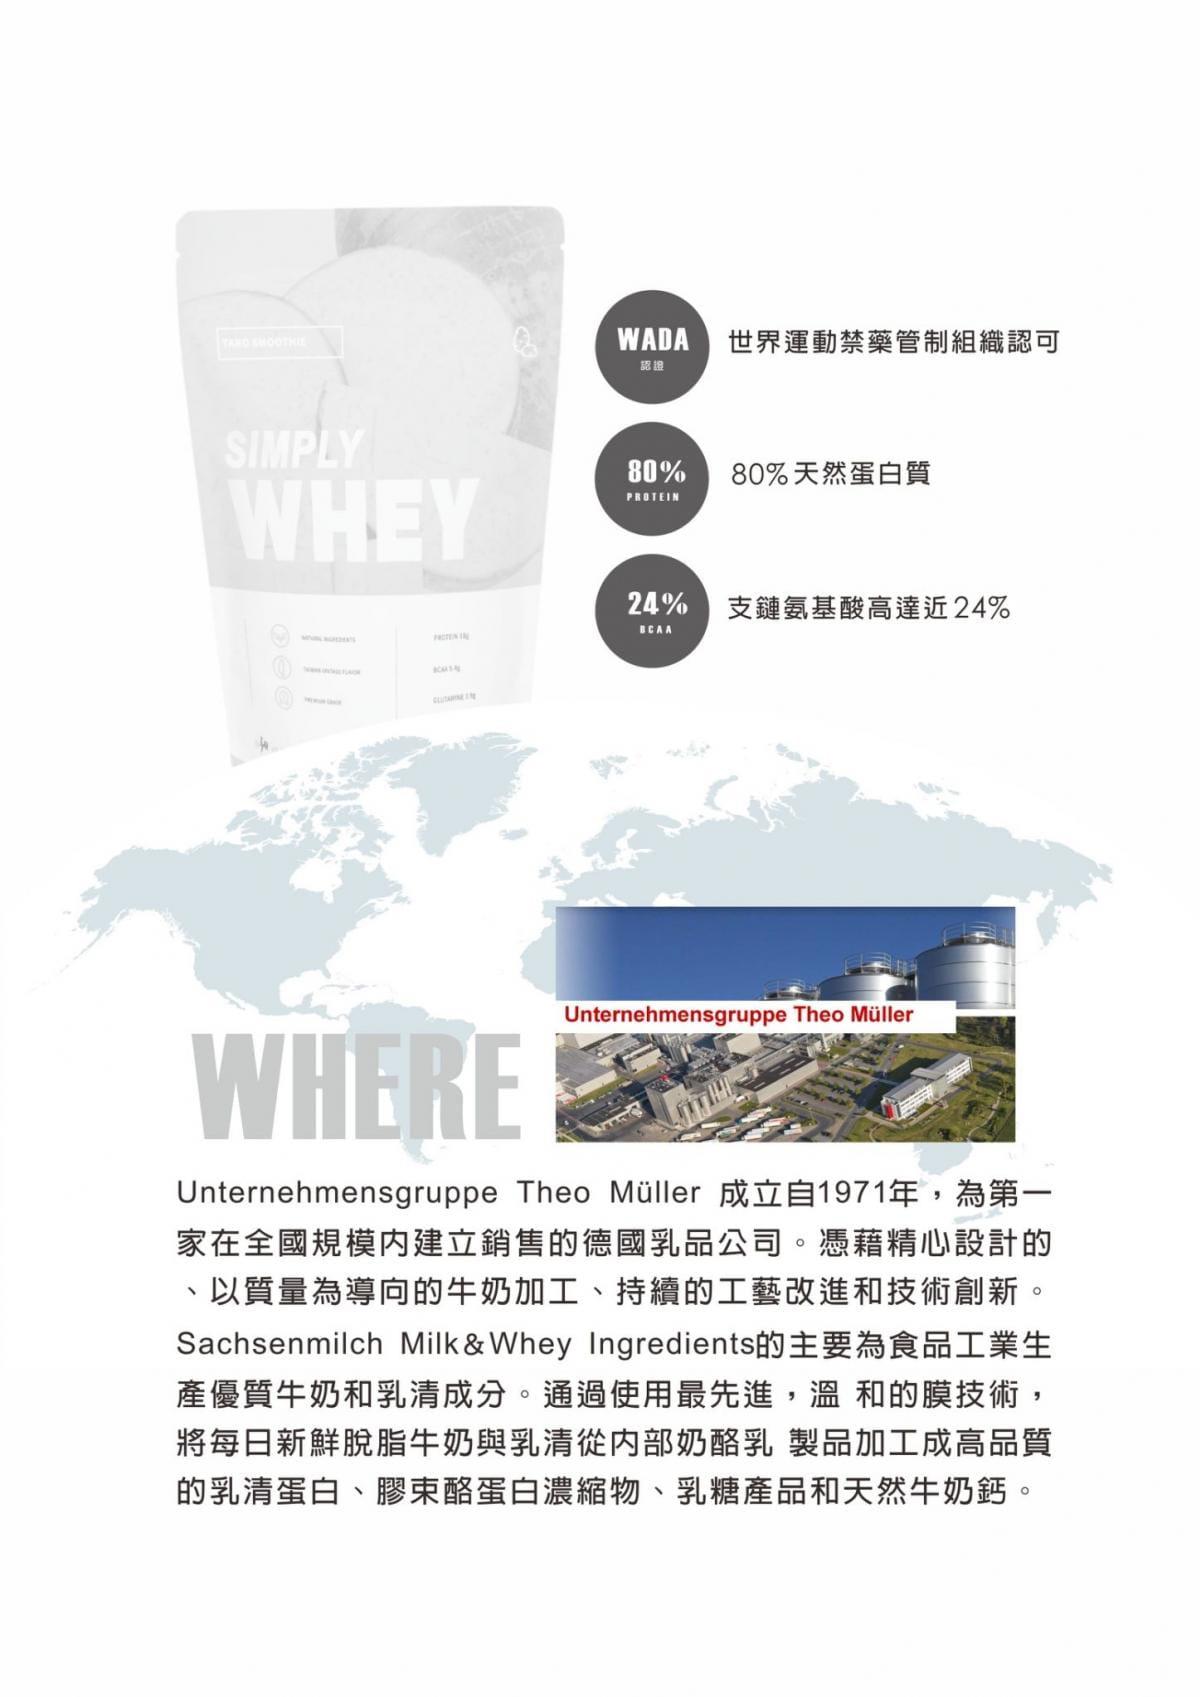 【LEXPORTS 勵動風潮】IS PROTEIN 乳清蛋白飲 - 單包裝(25g/包) 3